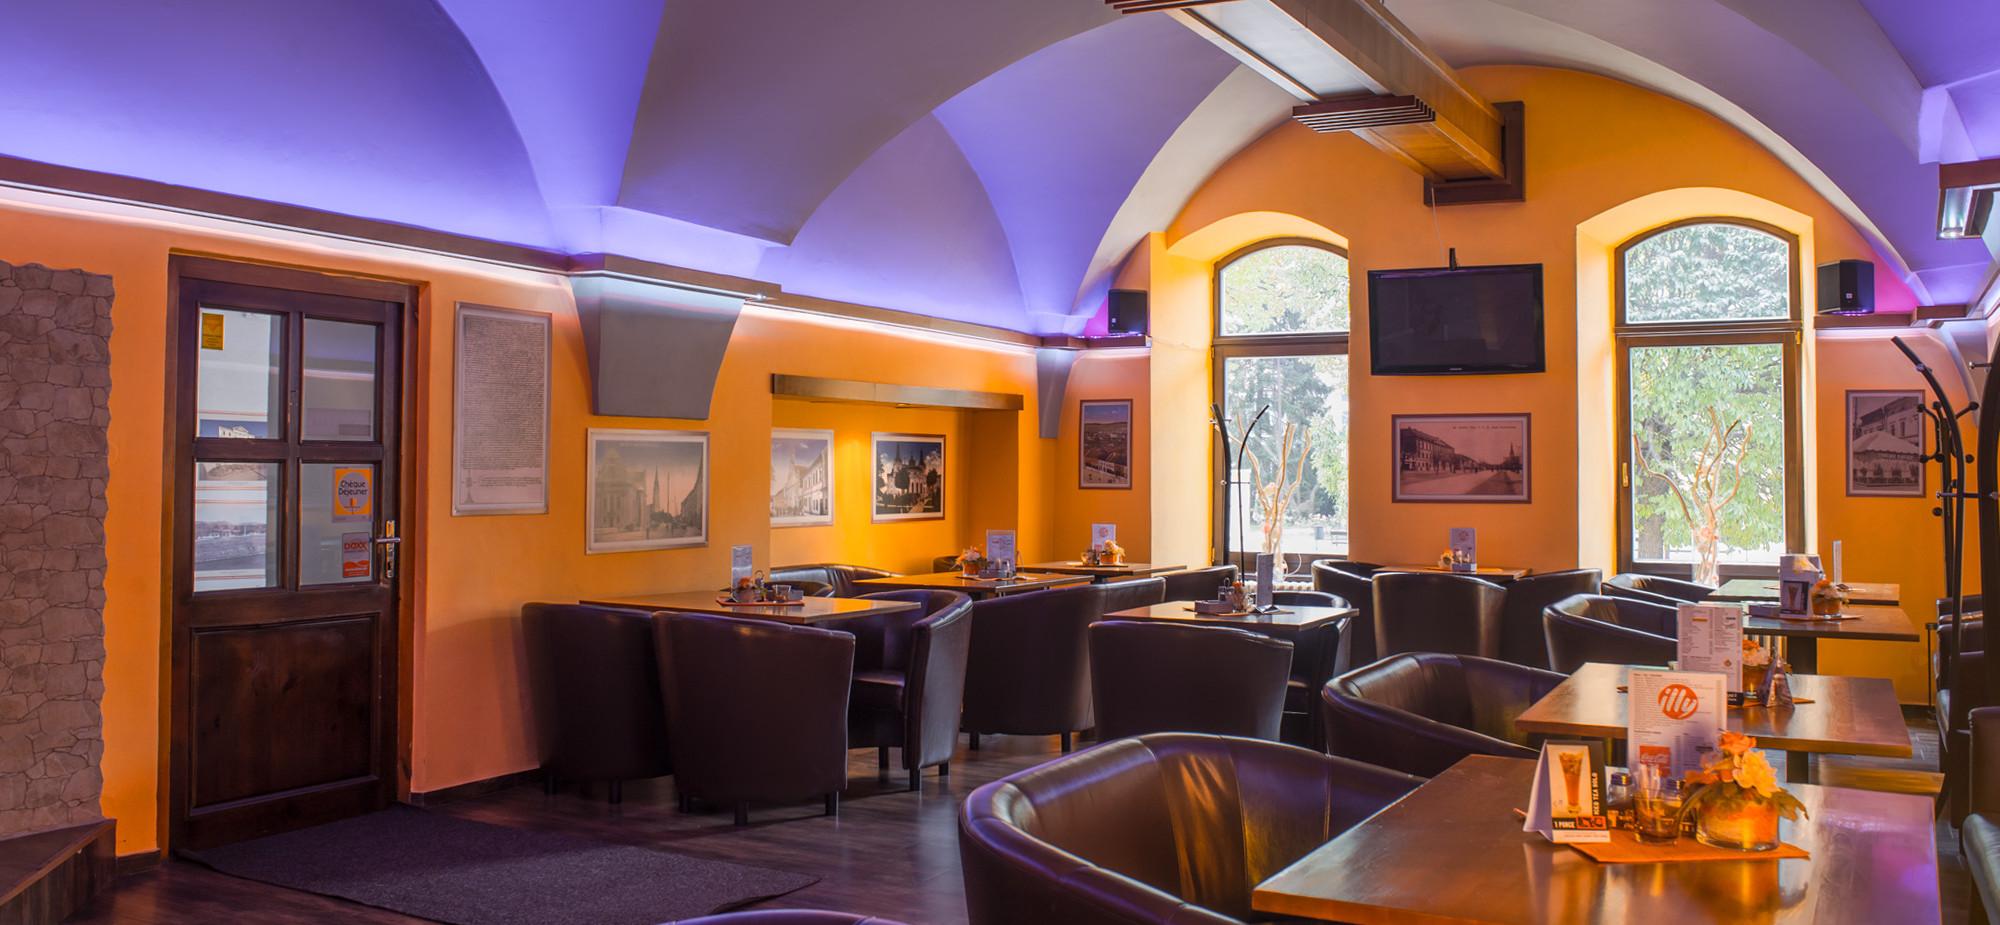 Spiš restaurant - kaviareň